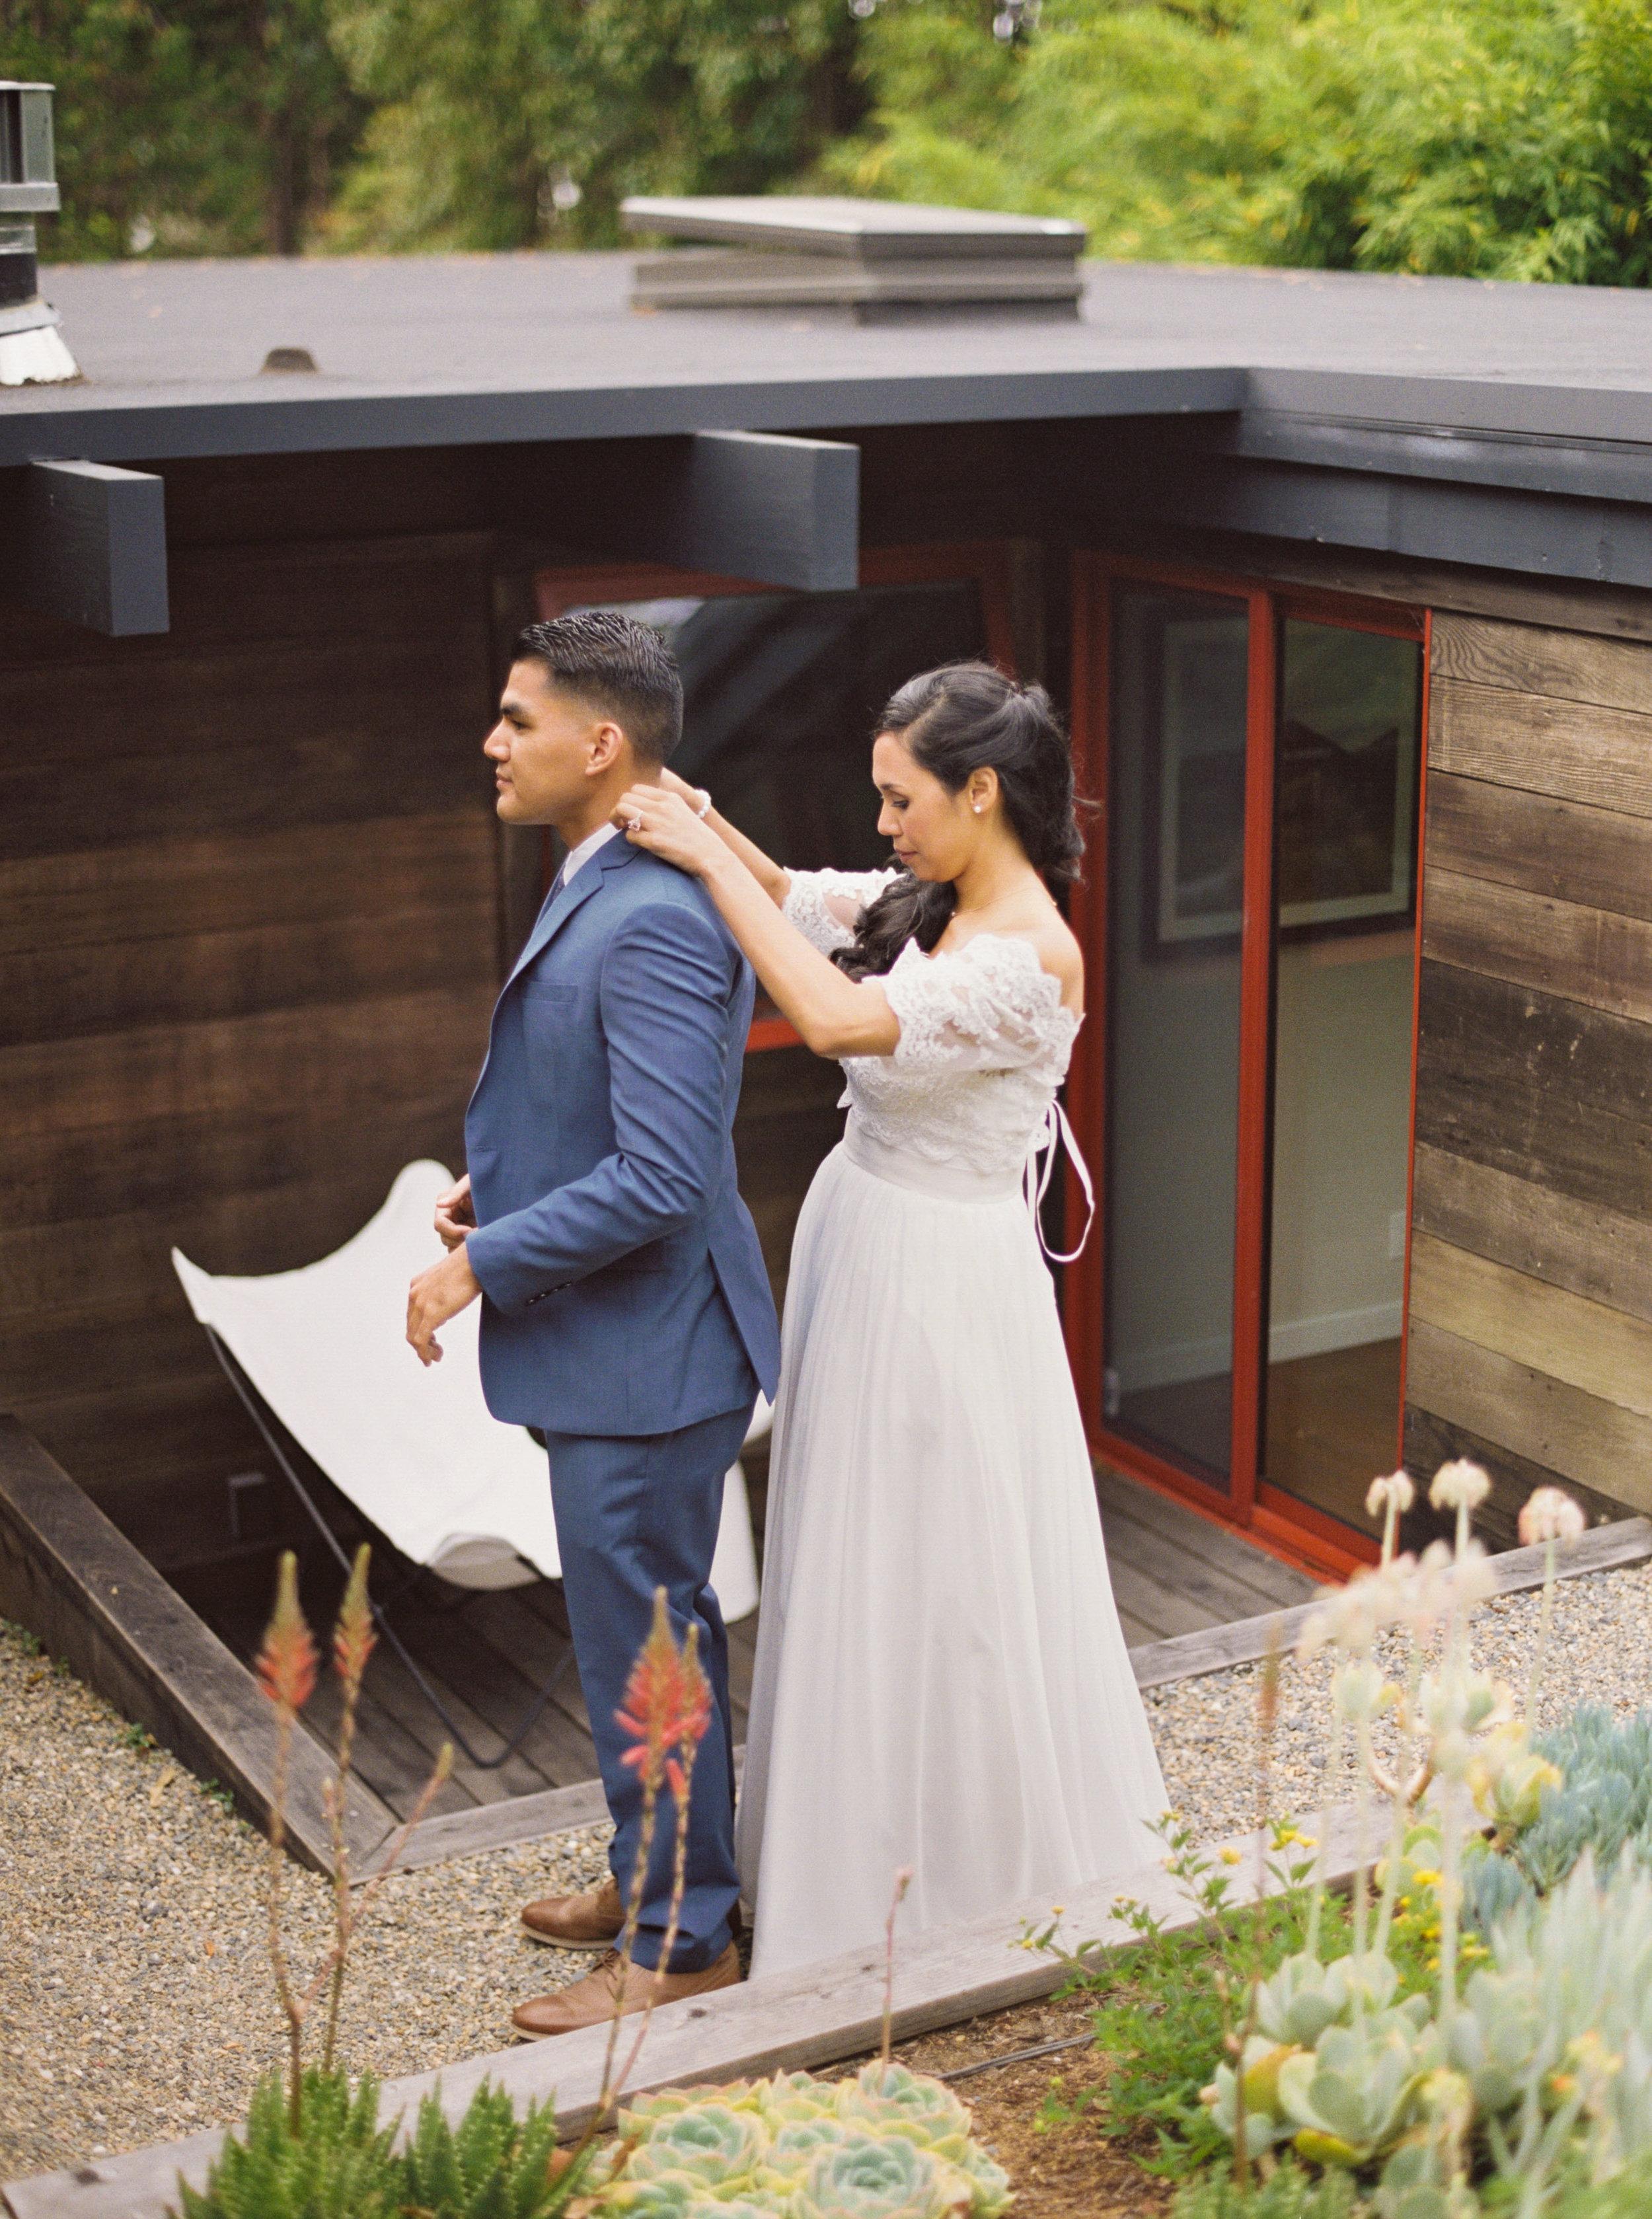 021_Krysten-Crebin-Bay-Area-Elopement-Wedding-Photographer-Videographer.jpg